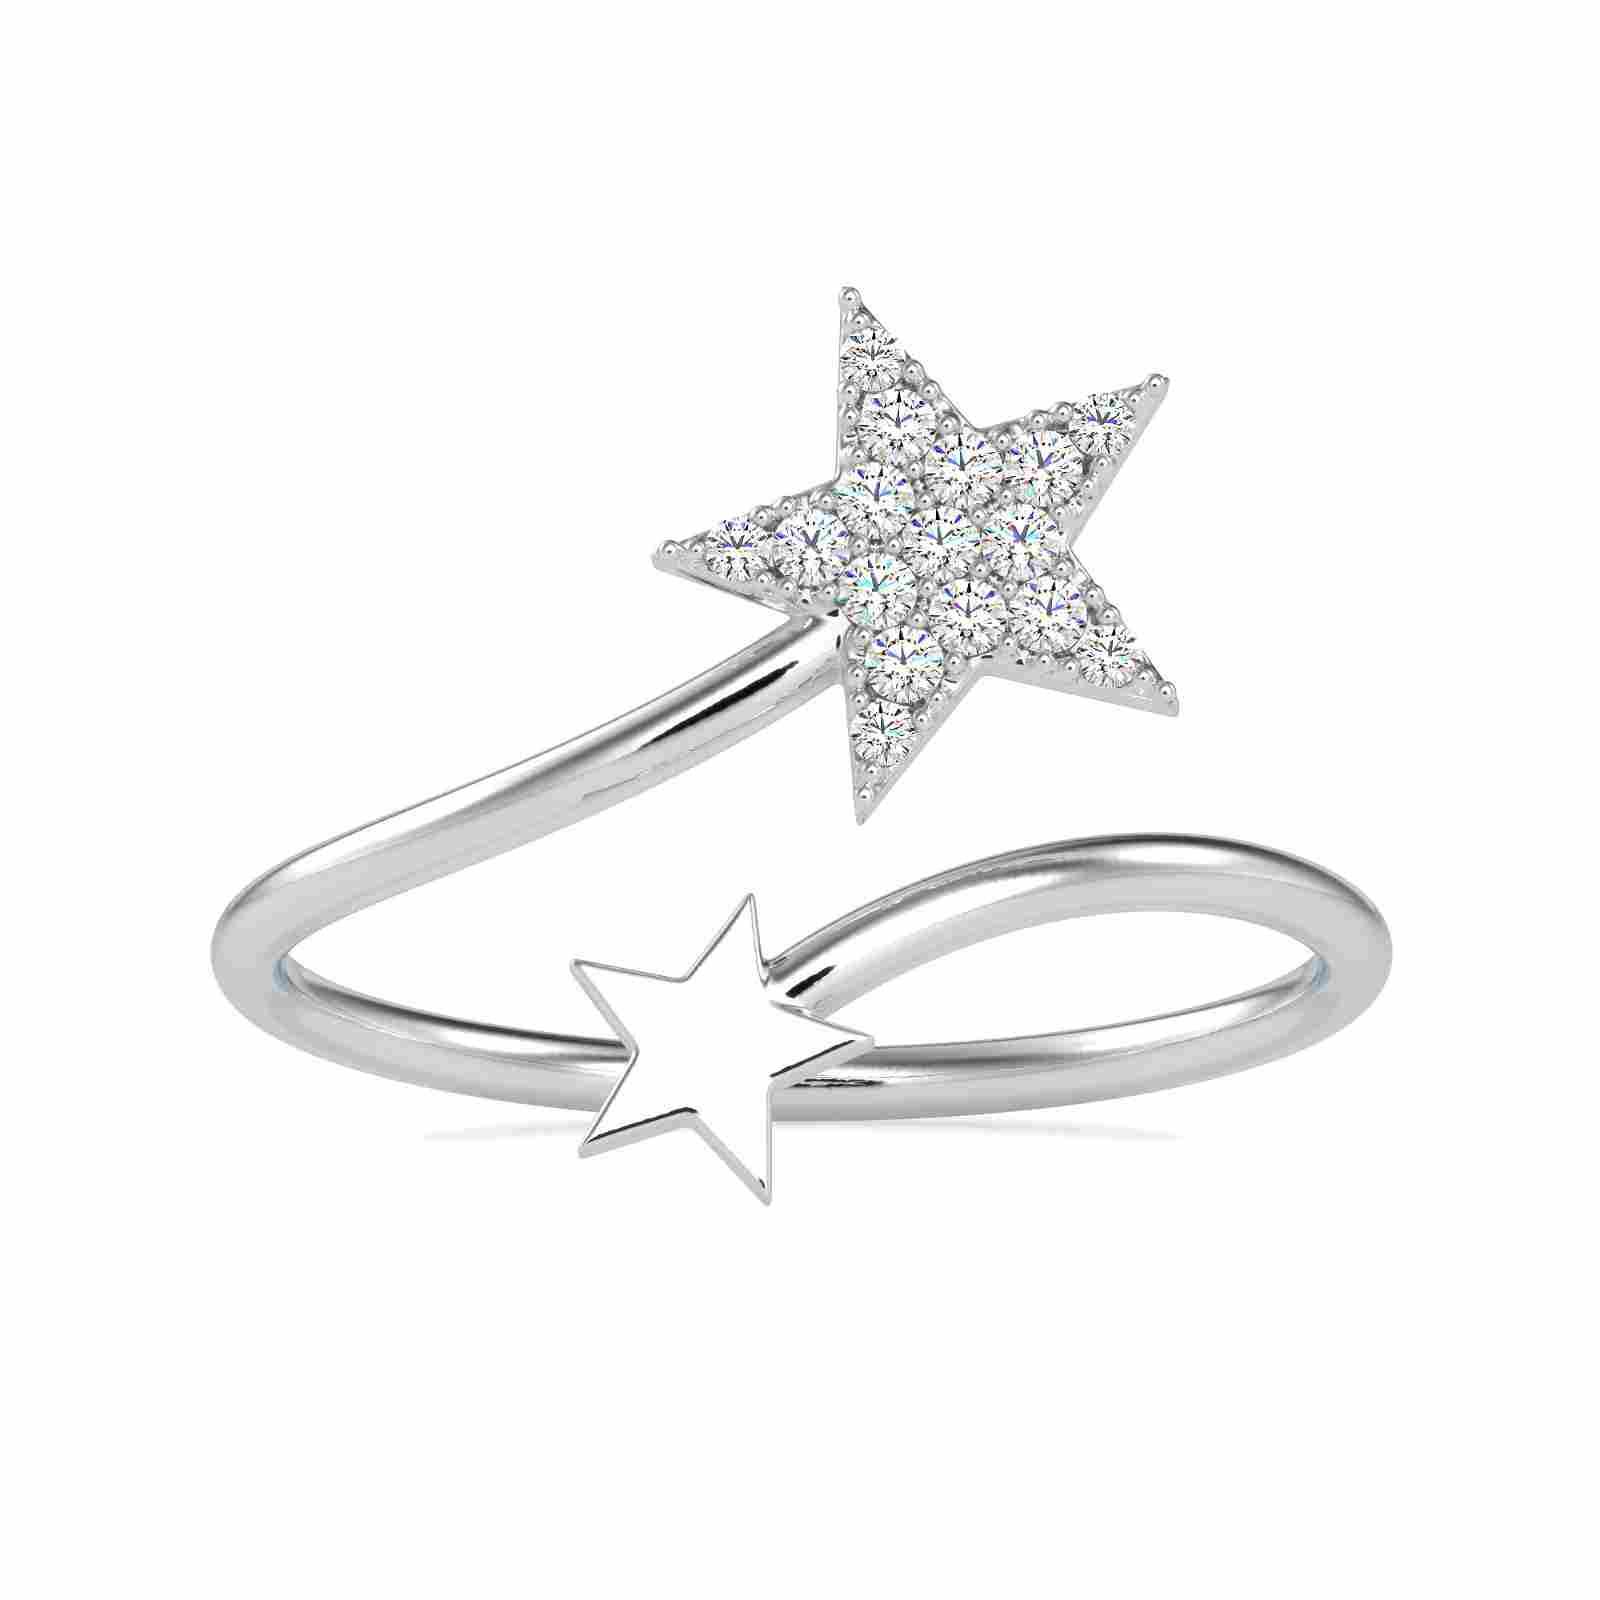 0.09CT Natural Diamond 14K White Gold Ring